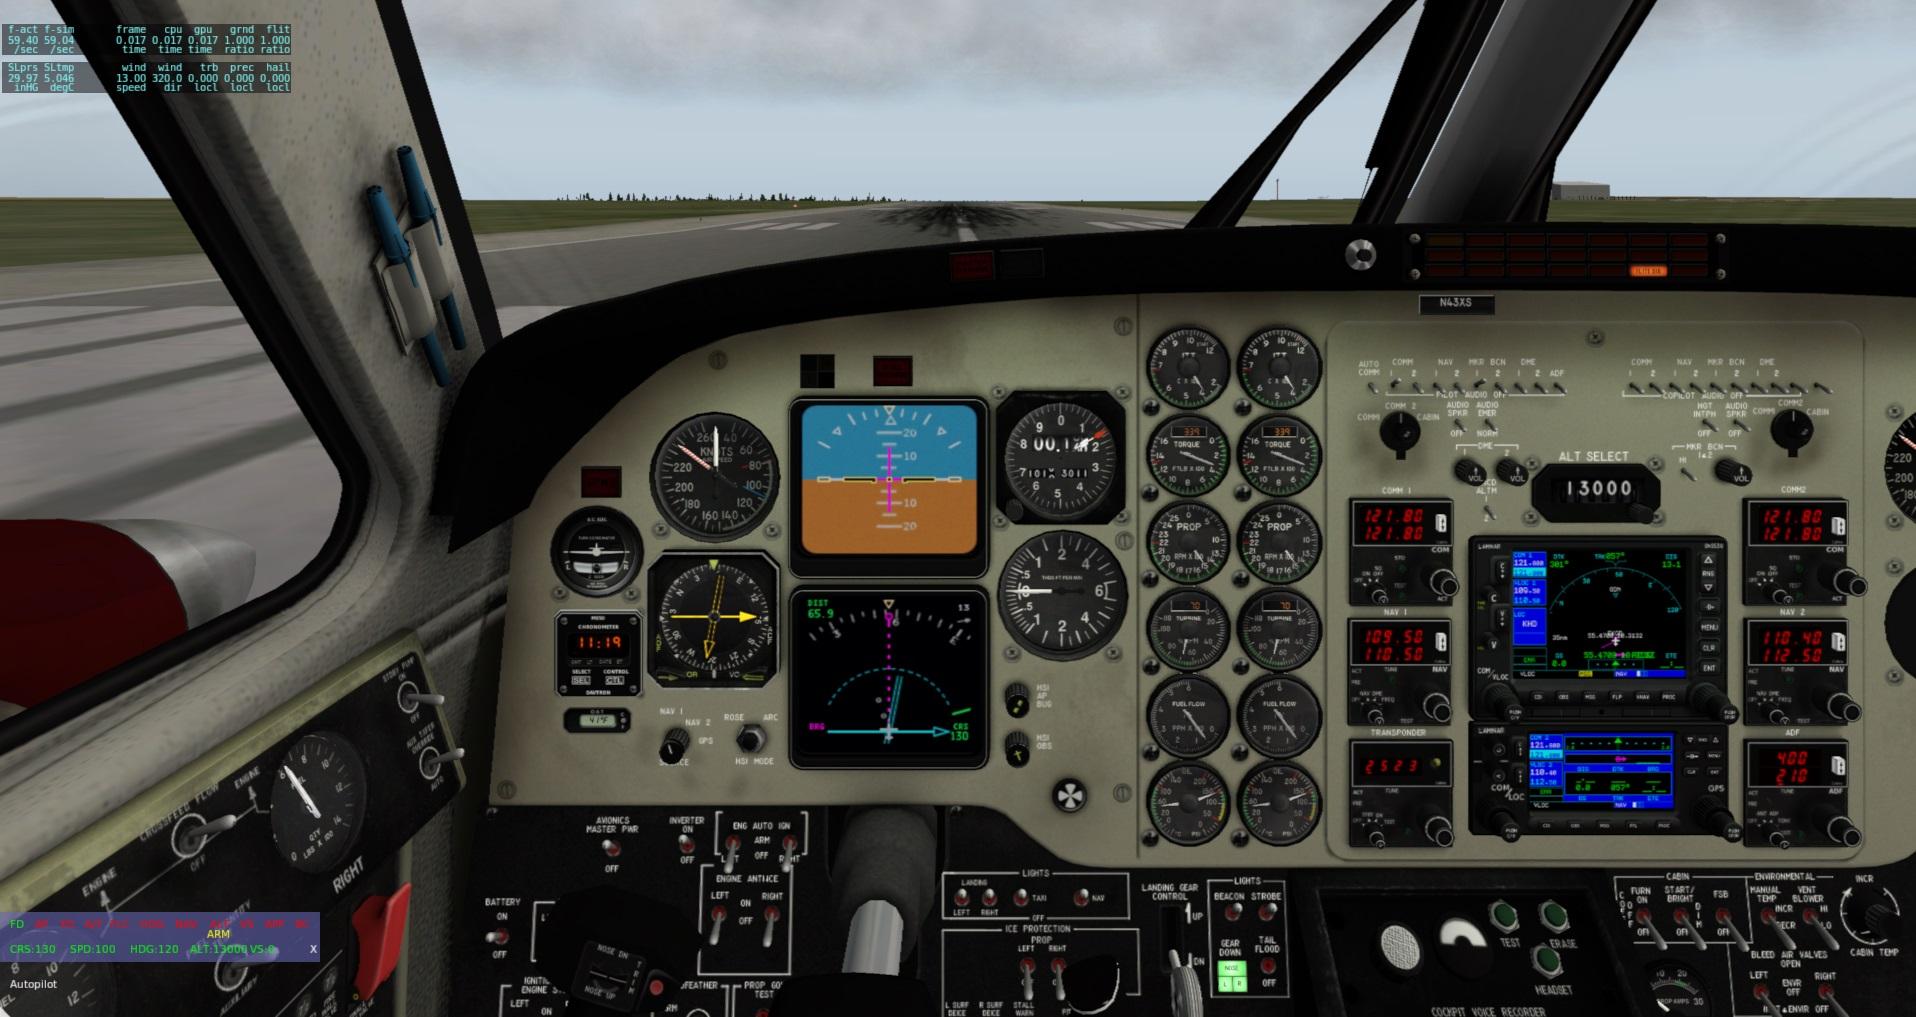 Universal autopilot - Utilities - X-Plane Org Forum